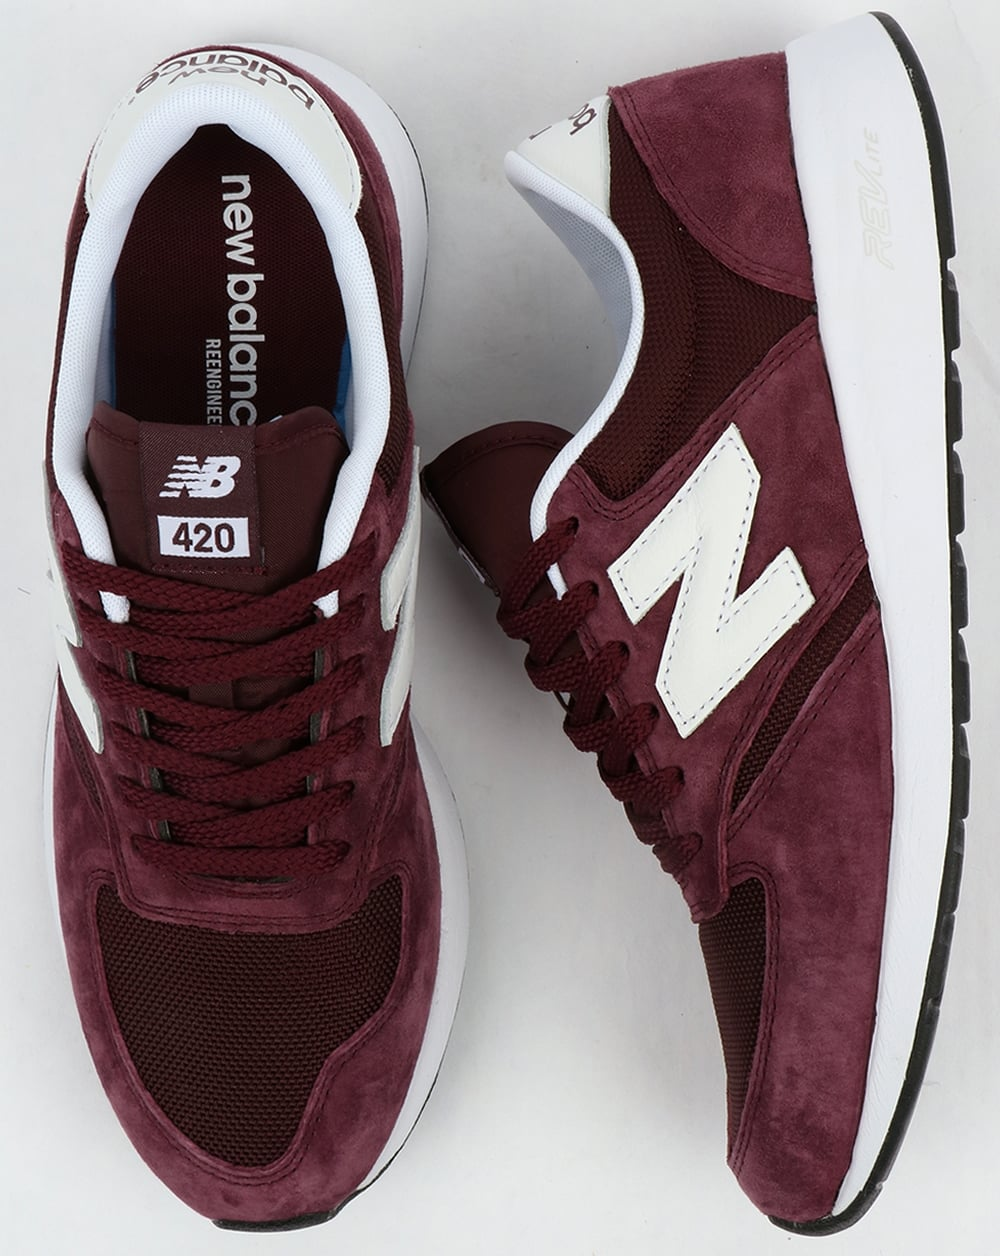 new balance 420 burgundy